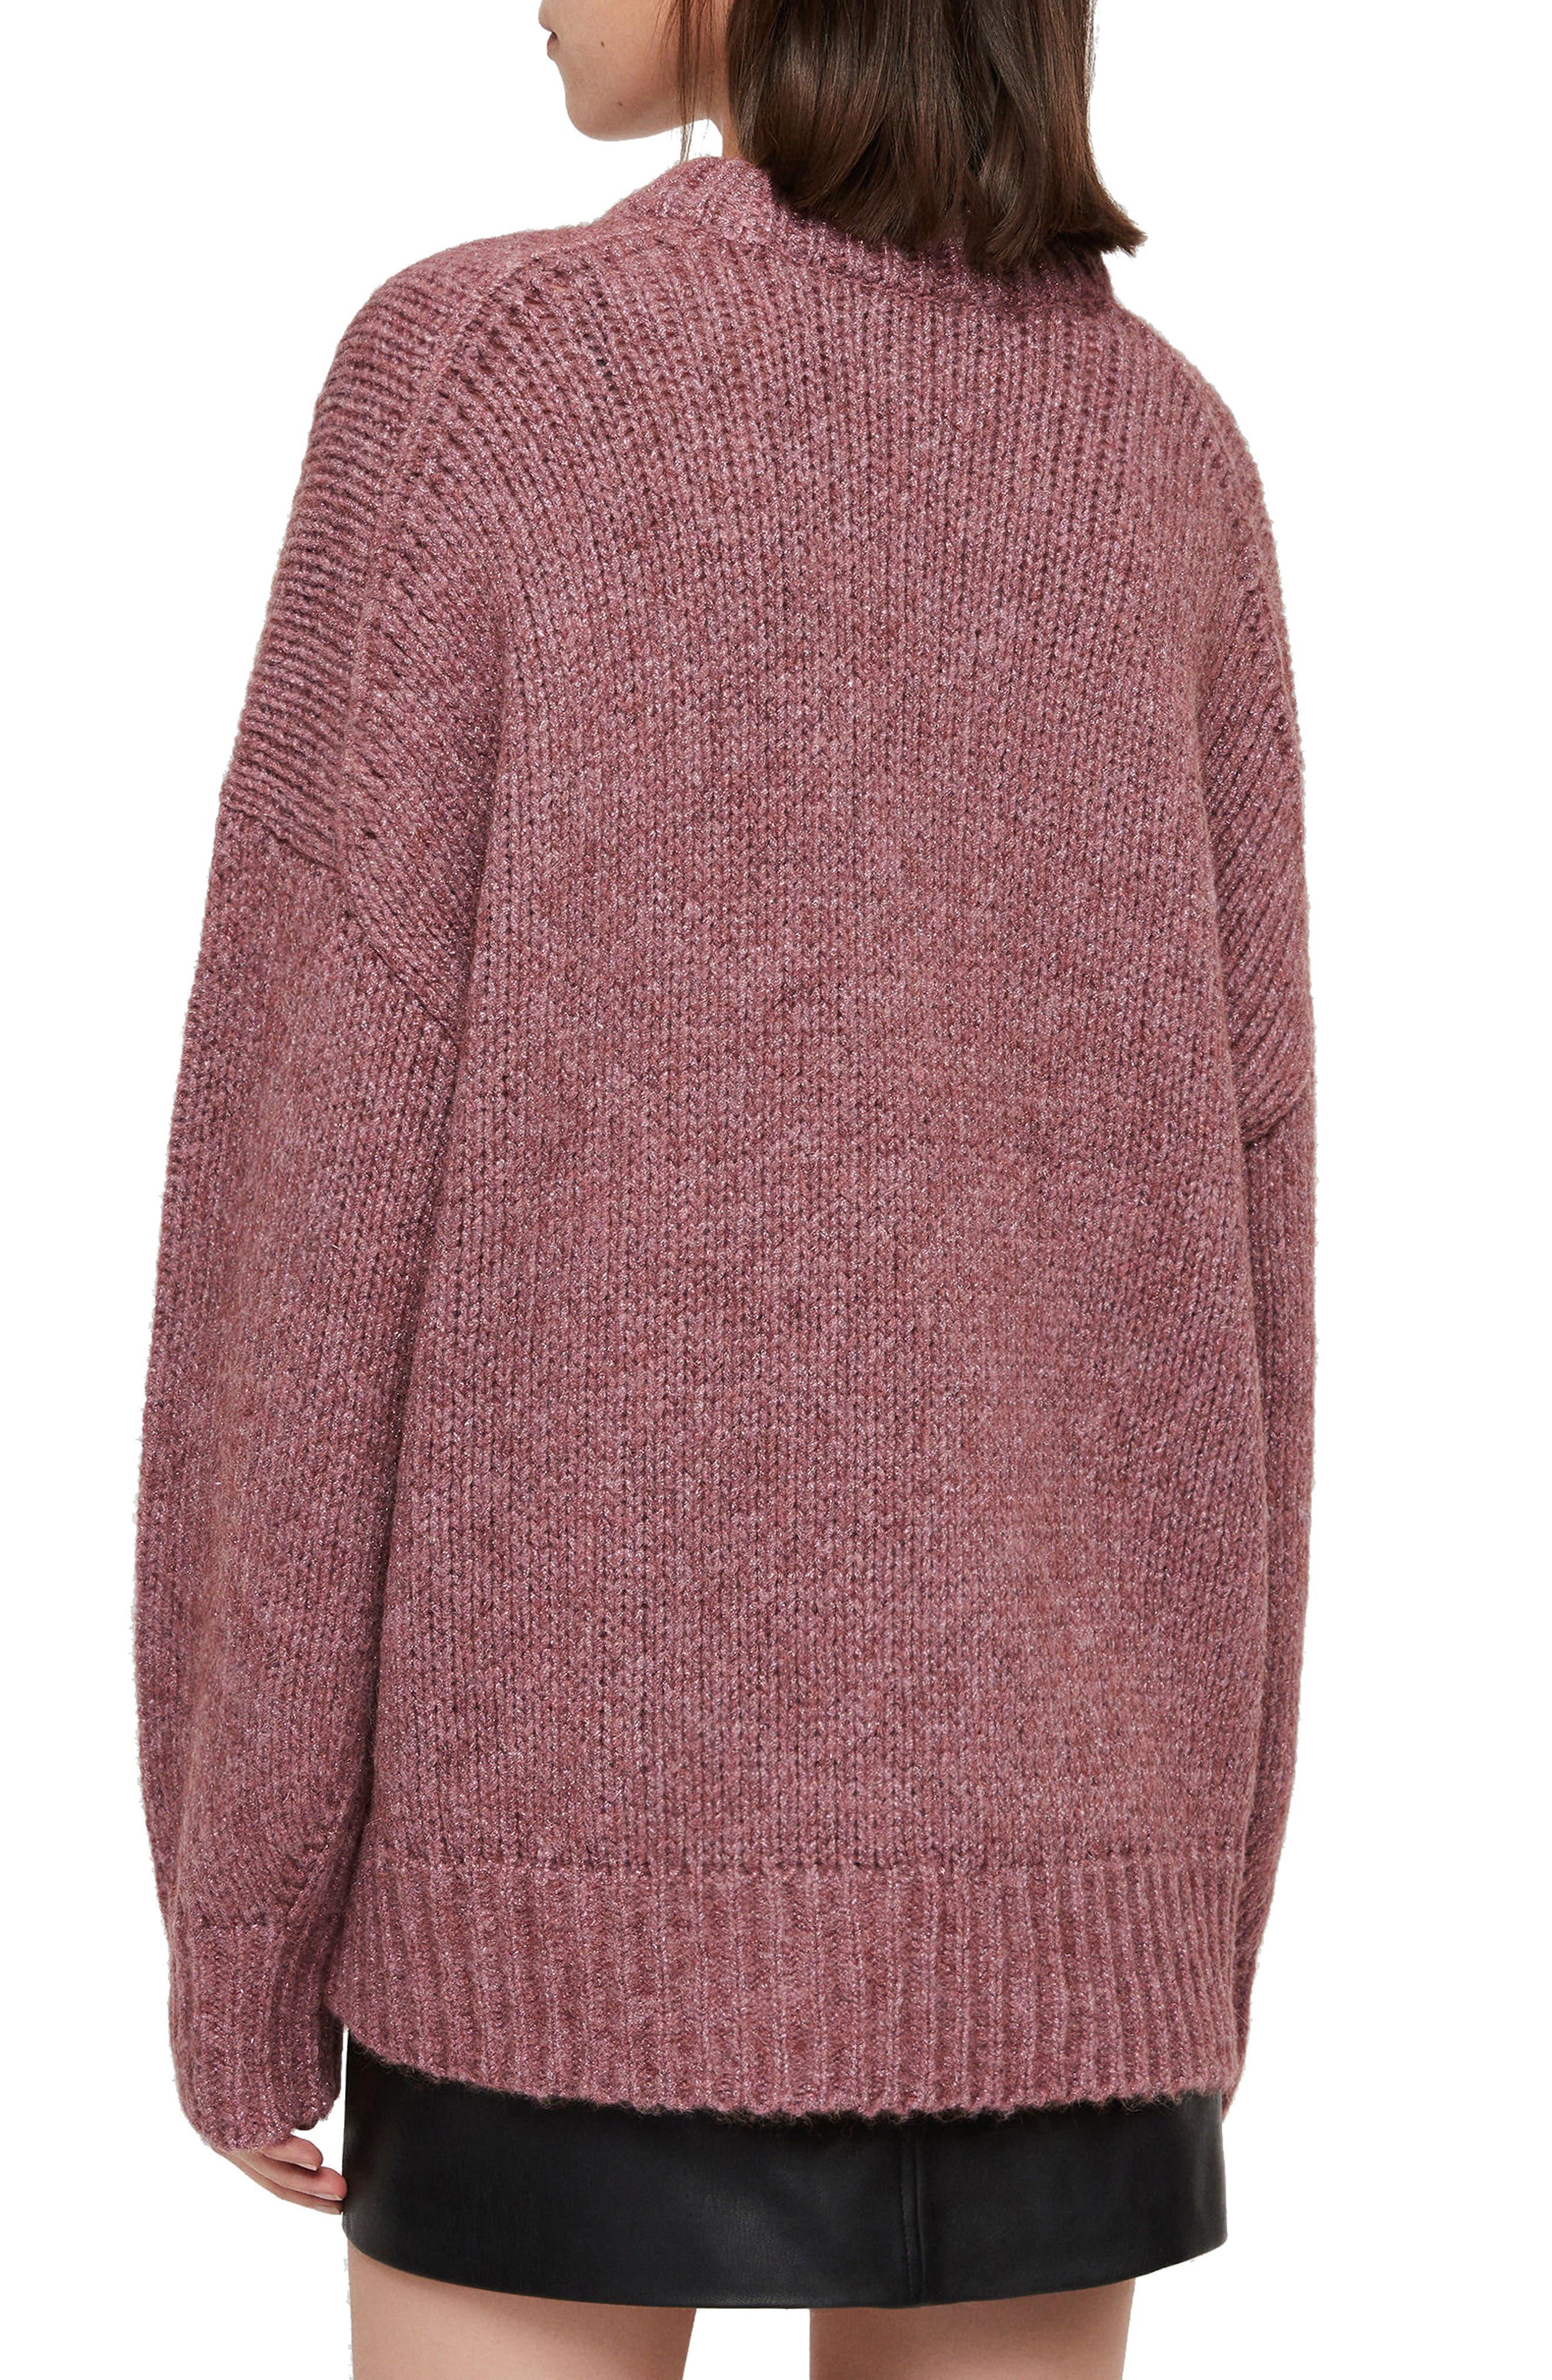 ALLSAINTS, Gemini Metallic Knit Sweater, Alternate thumbnail 2, color, 653